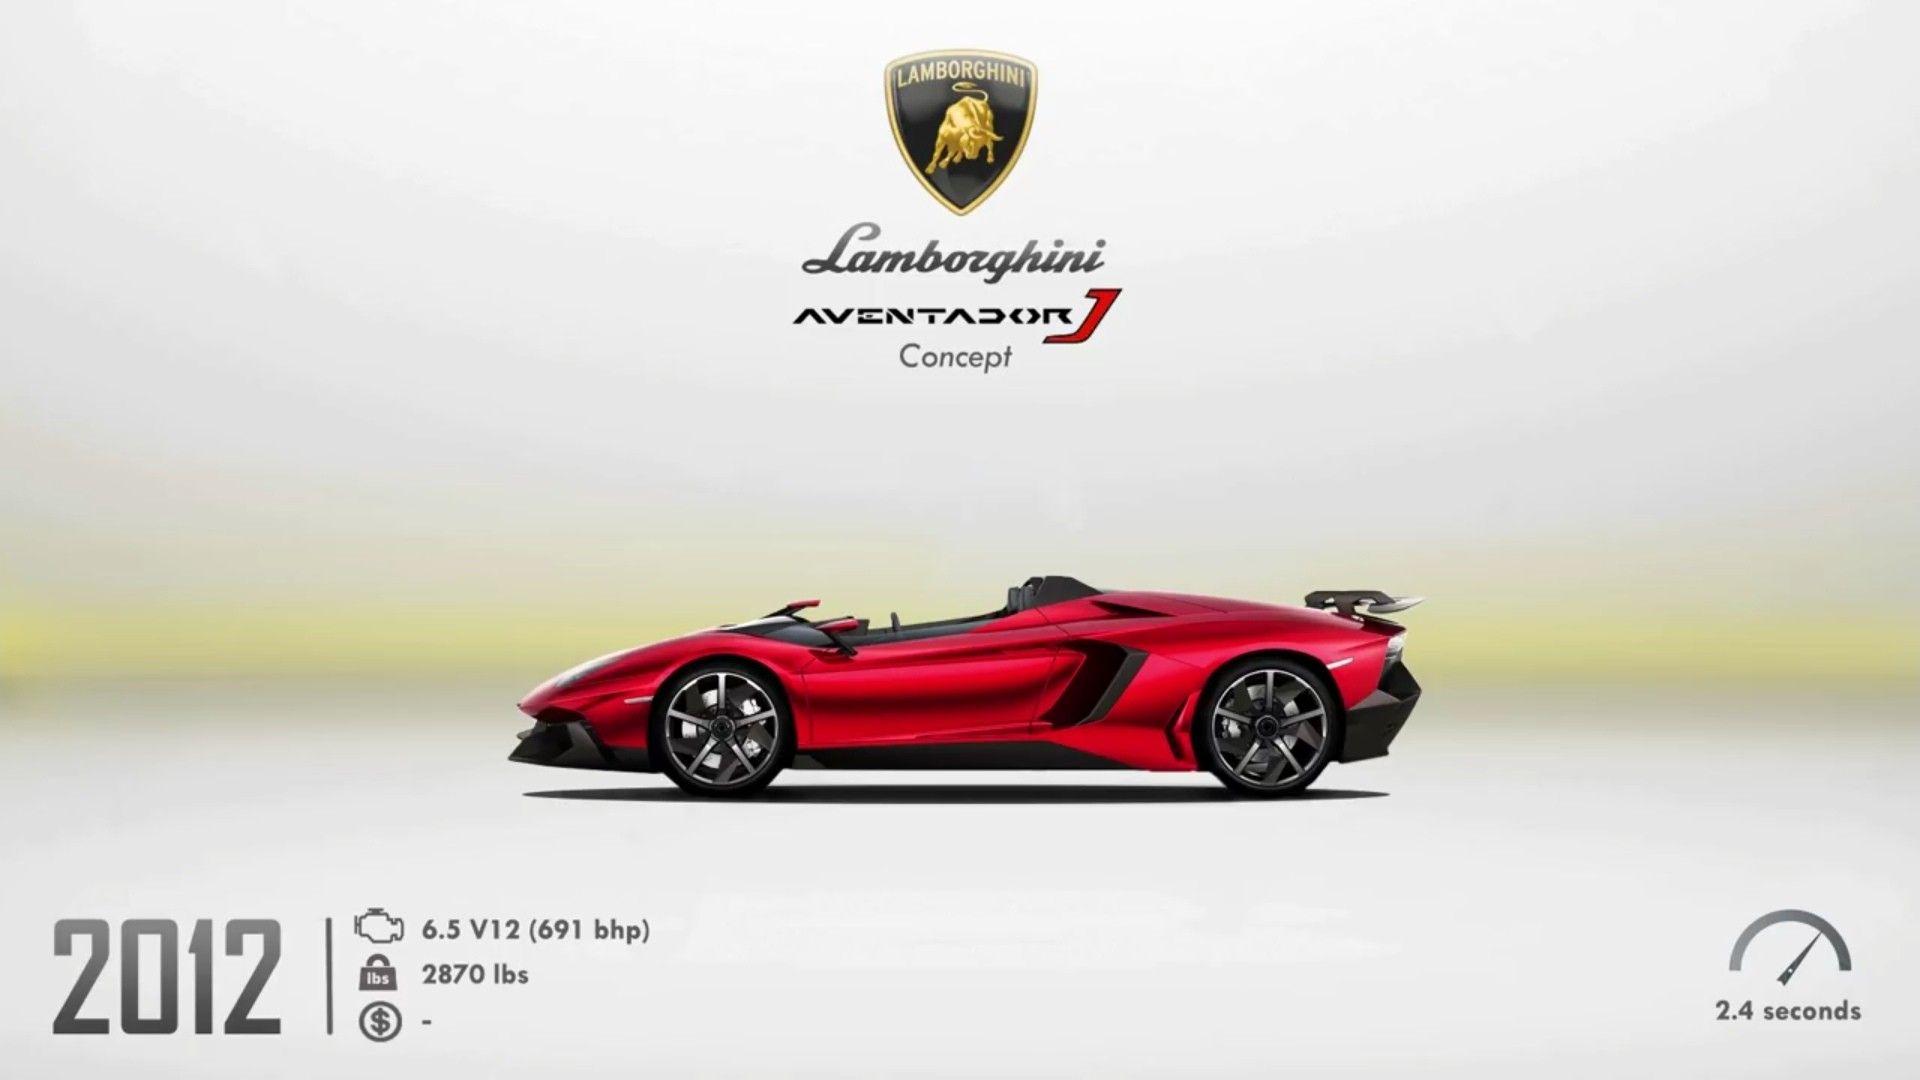 Lamborghini Aventador J Concept Awesome Lamborghinis Lamborghini